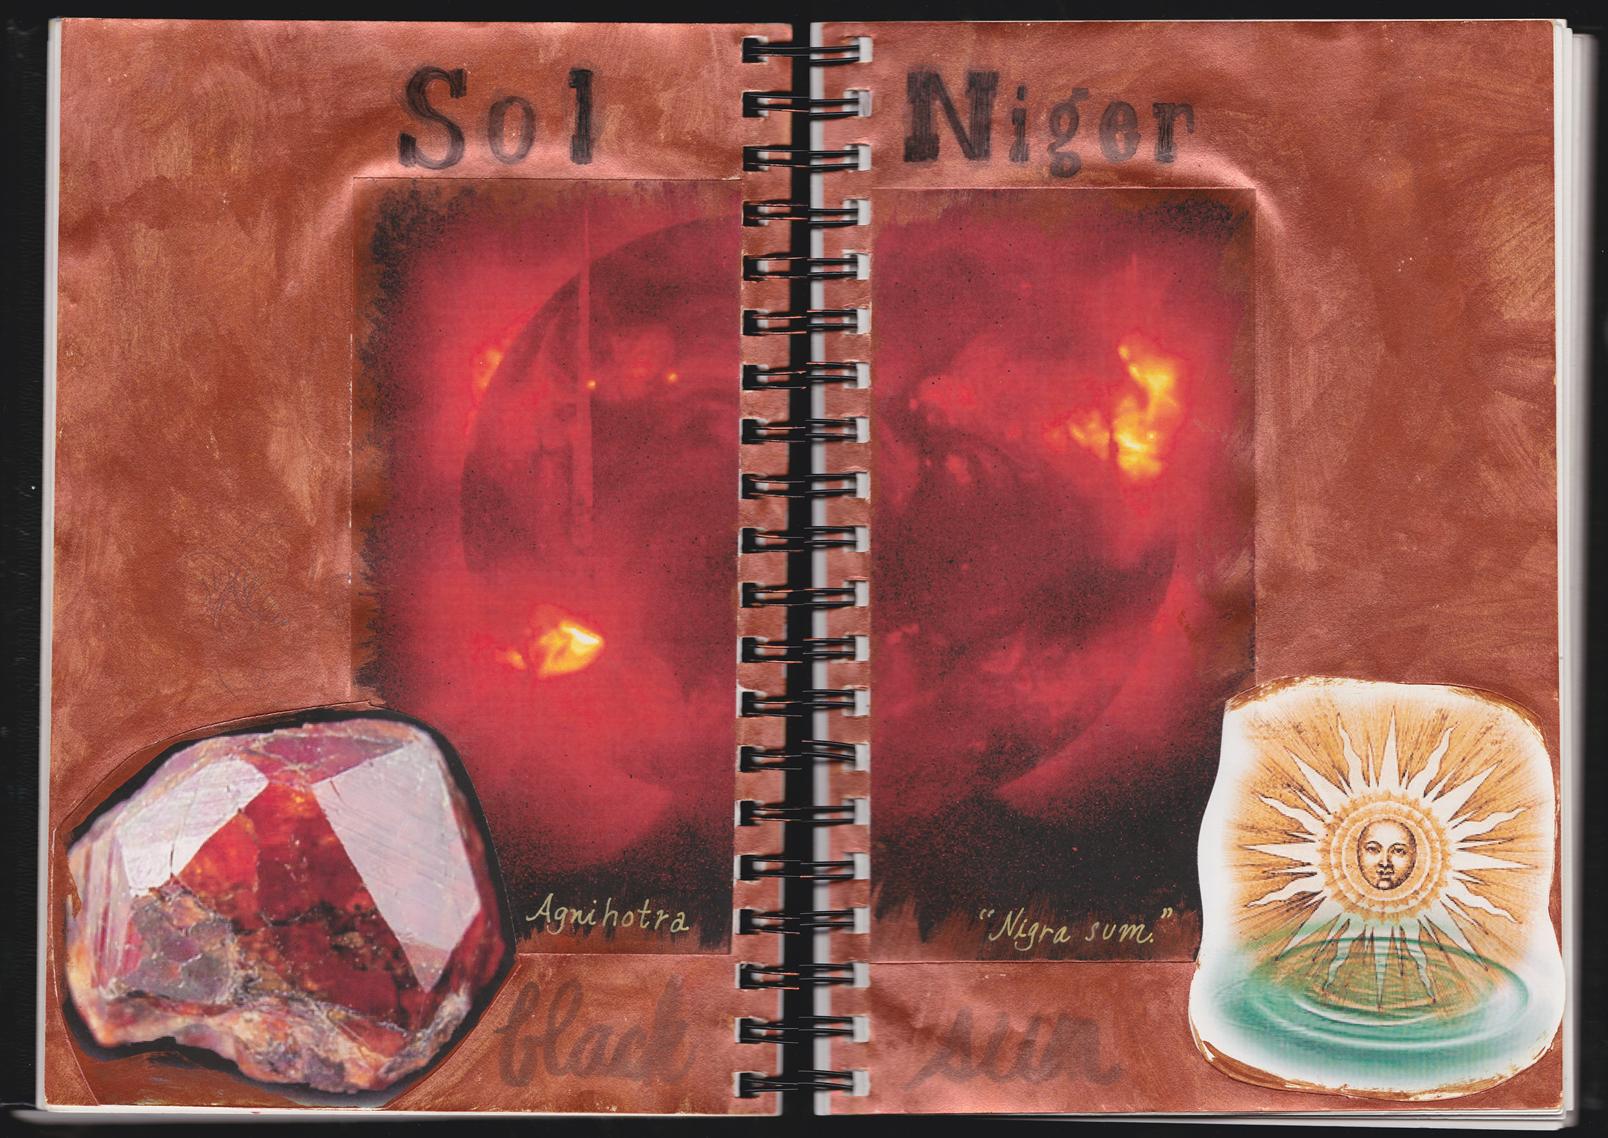 Sol Niger